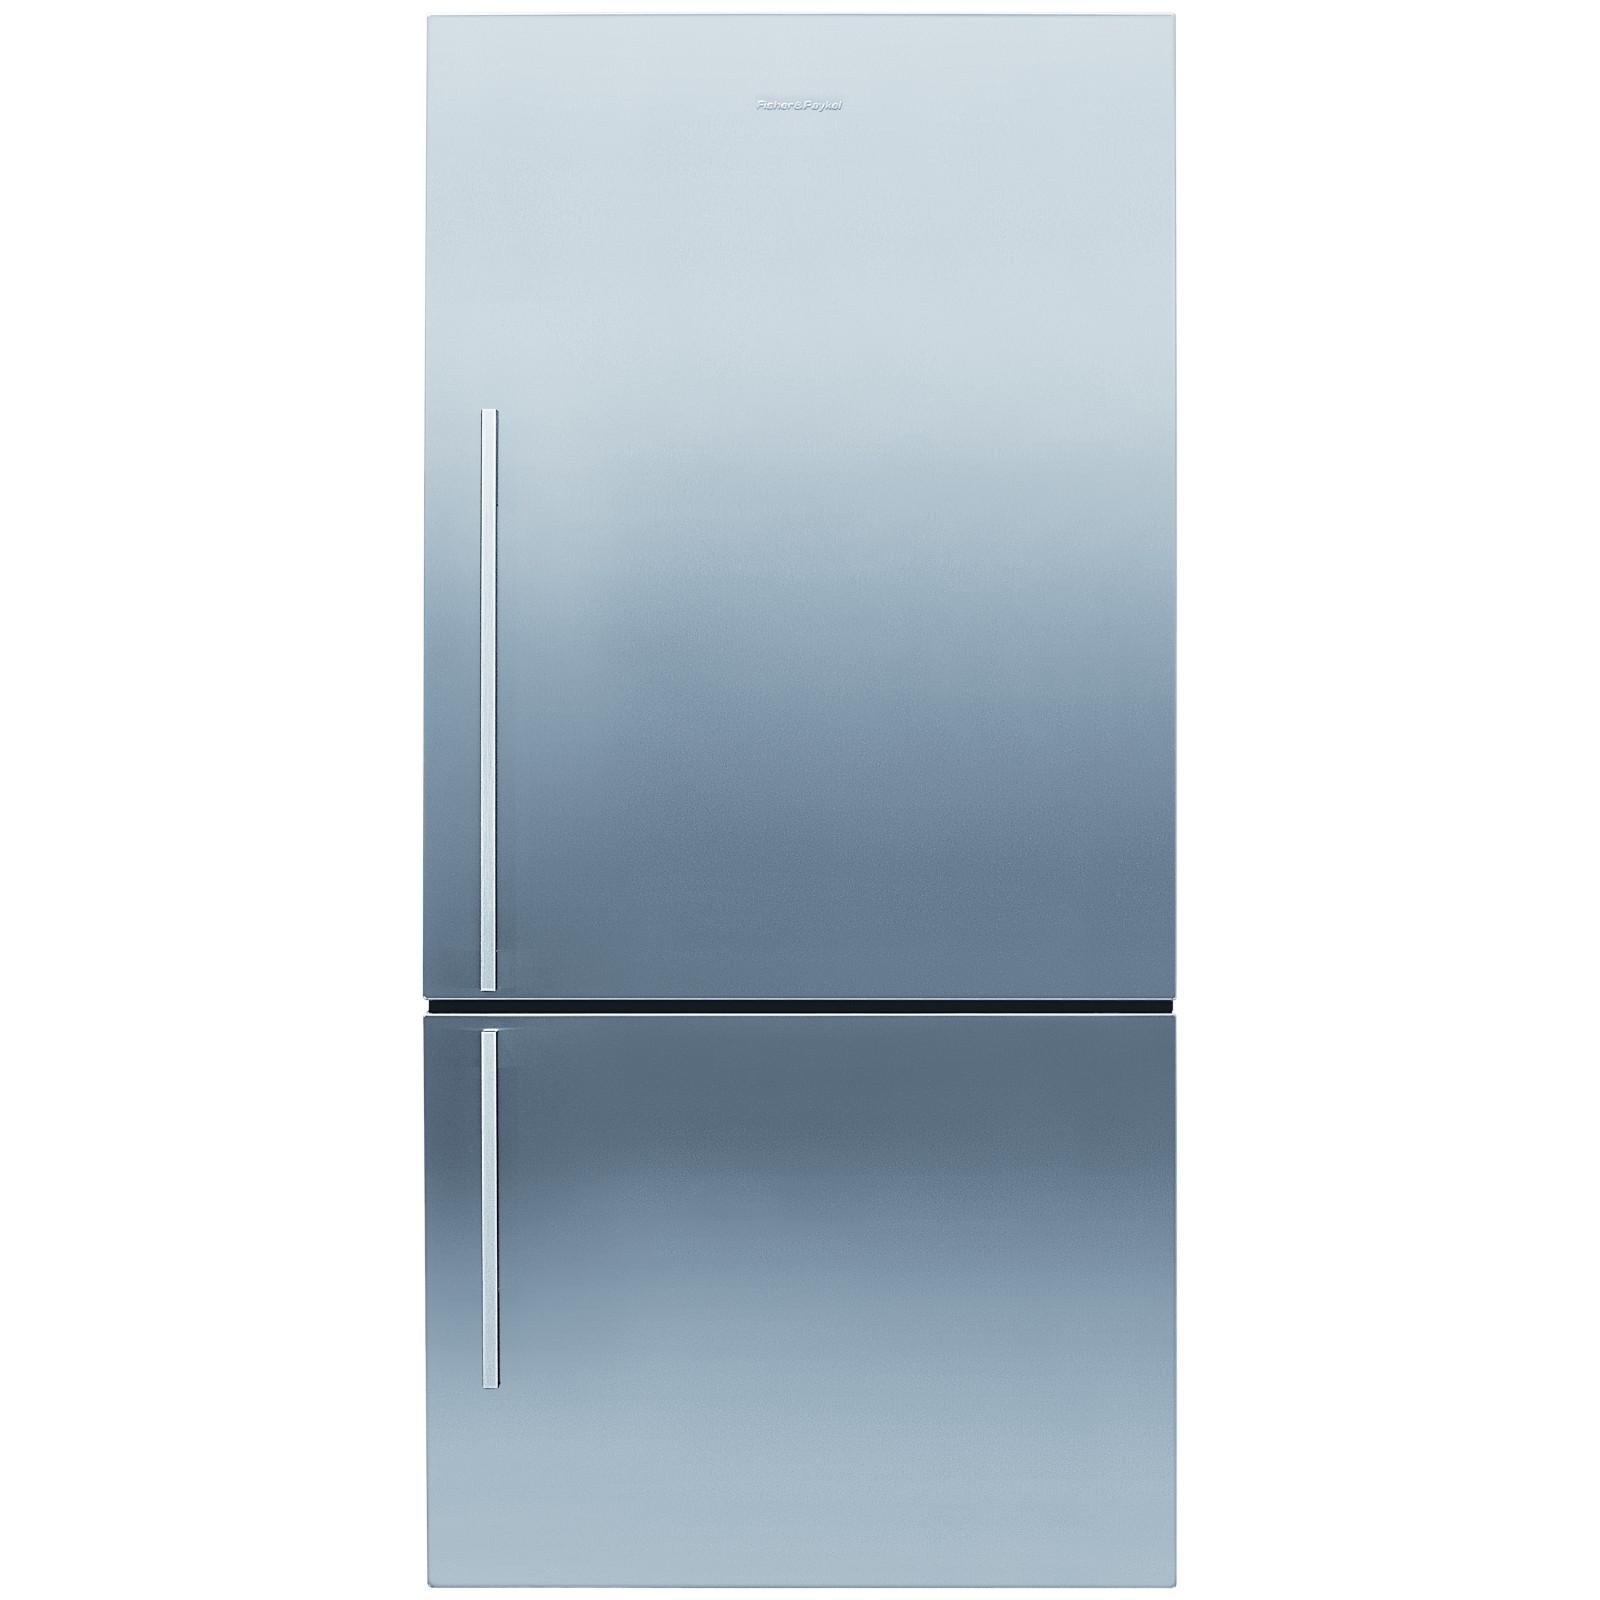 Fisher & Paykel E402BRXFD4 Fridge Freezer